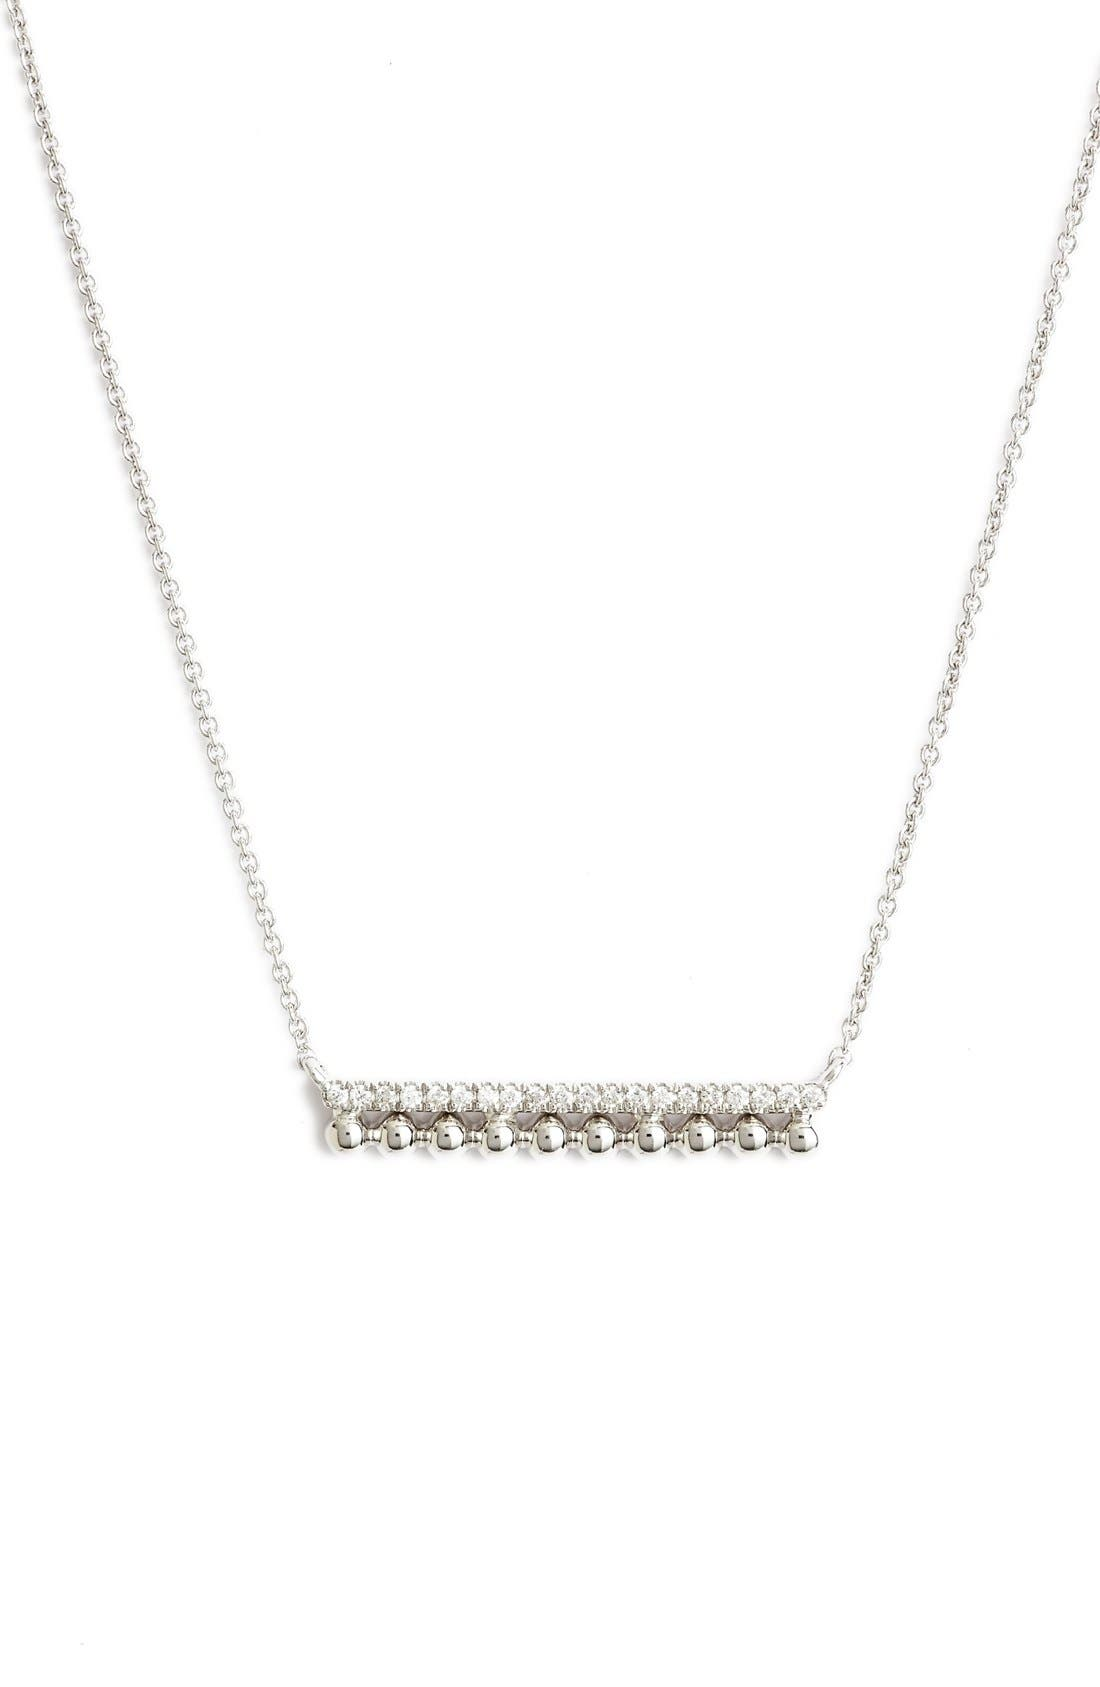 Main Image - Dana Rebecca Designs 'Poppy Rae' Bar Pendant Necklace